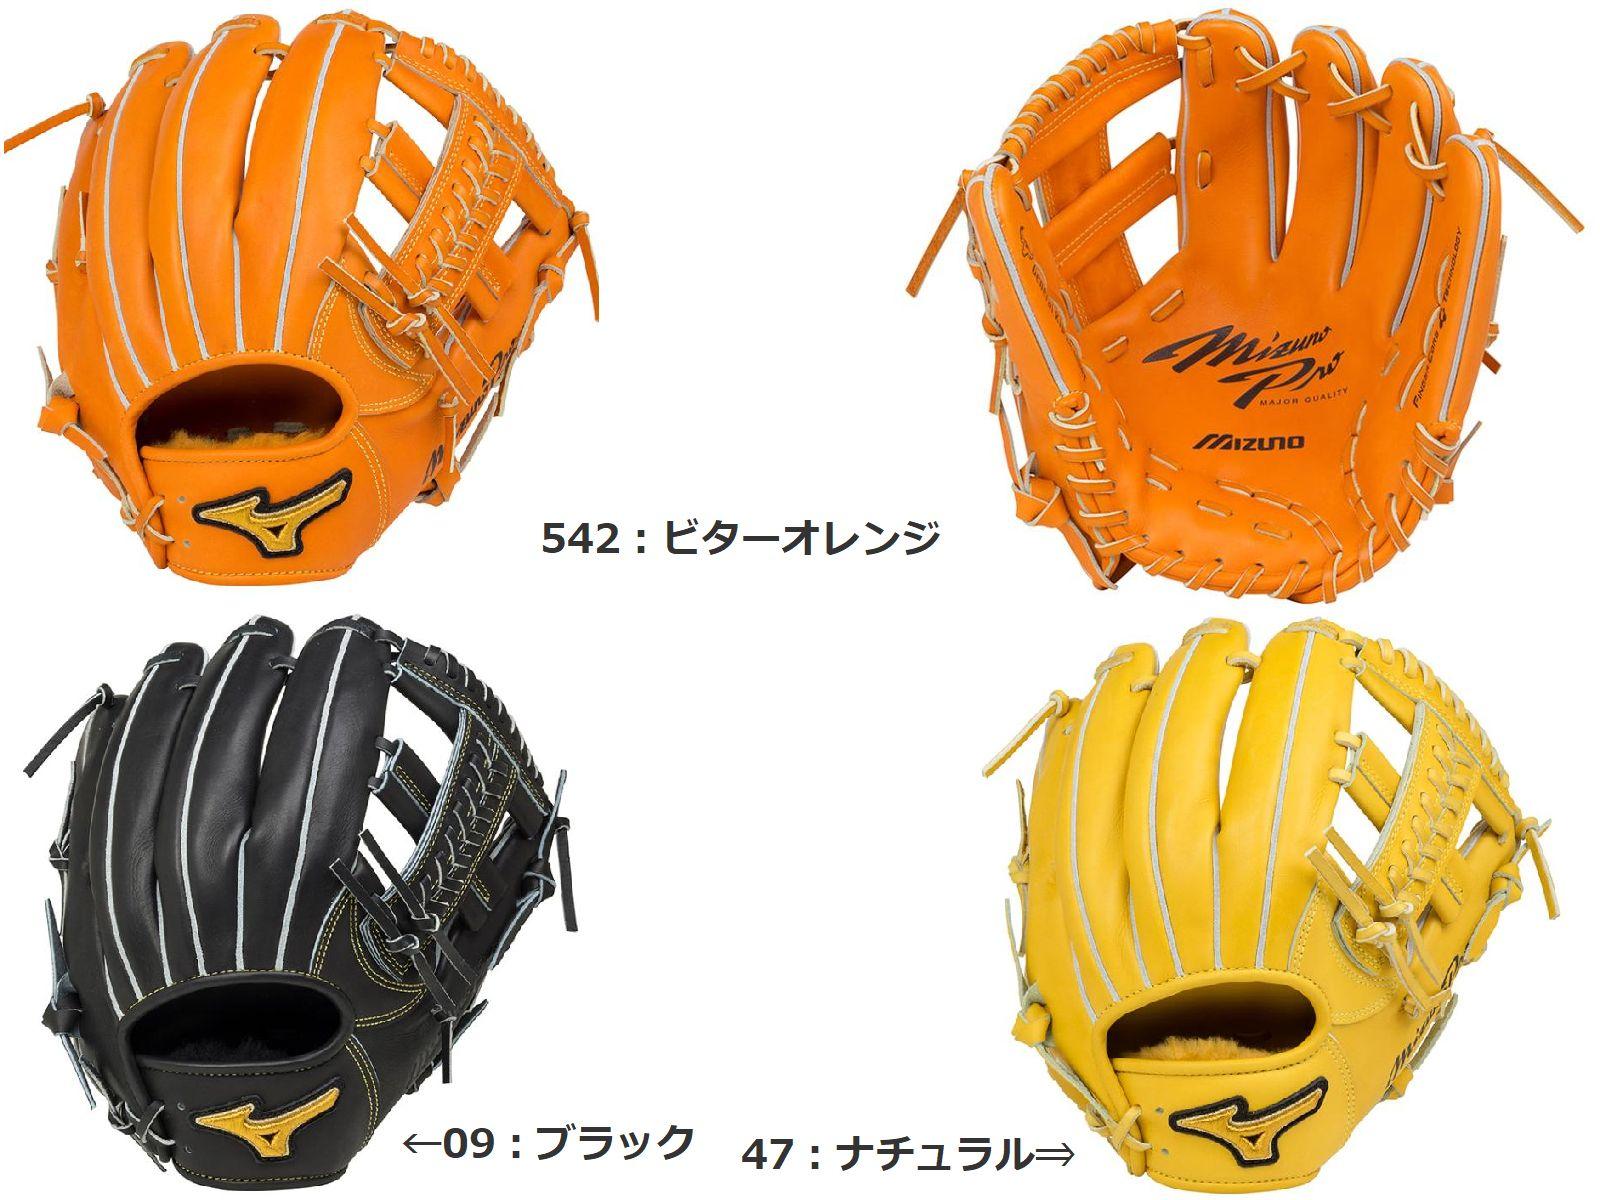 【Mizuno PRO=ミズノプロ】野球 一般 硬式用 グラブ グローブ<フィンガーコアテクノロジー【内野手用3 4/6(二塁手・遊撃手向)】【ジェネラルキップレザー】>[ポケットウェブ下タイプ](サイズ:9)<ナチュラル/ビターオレンジ/ブラック>(右投用)